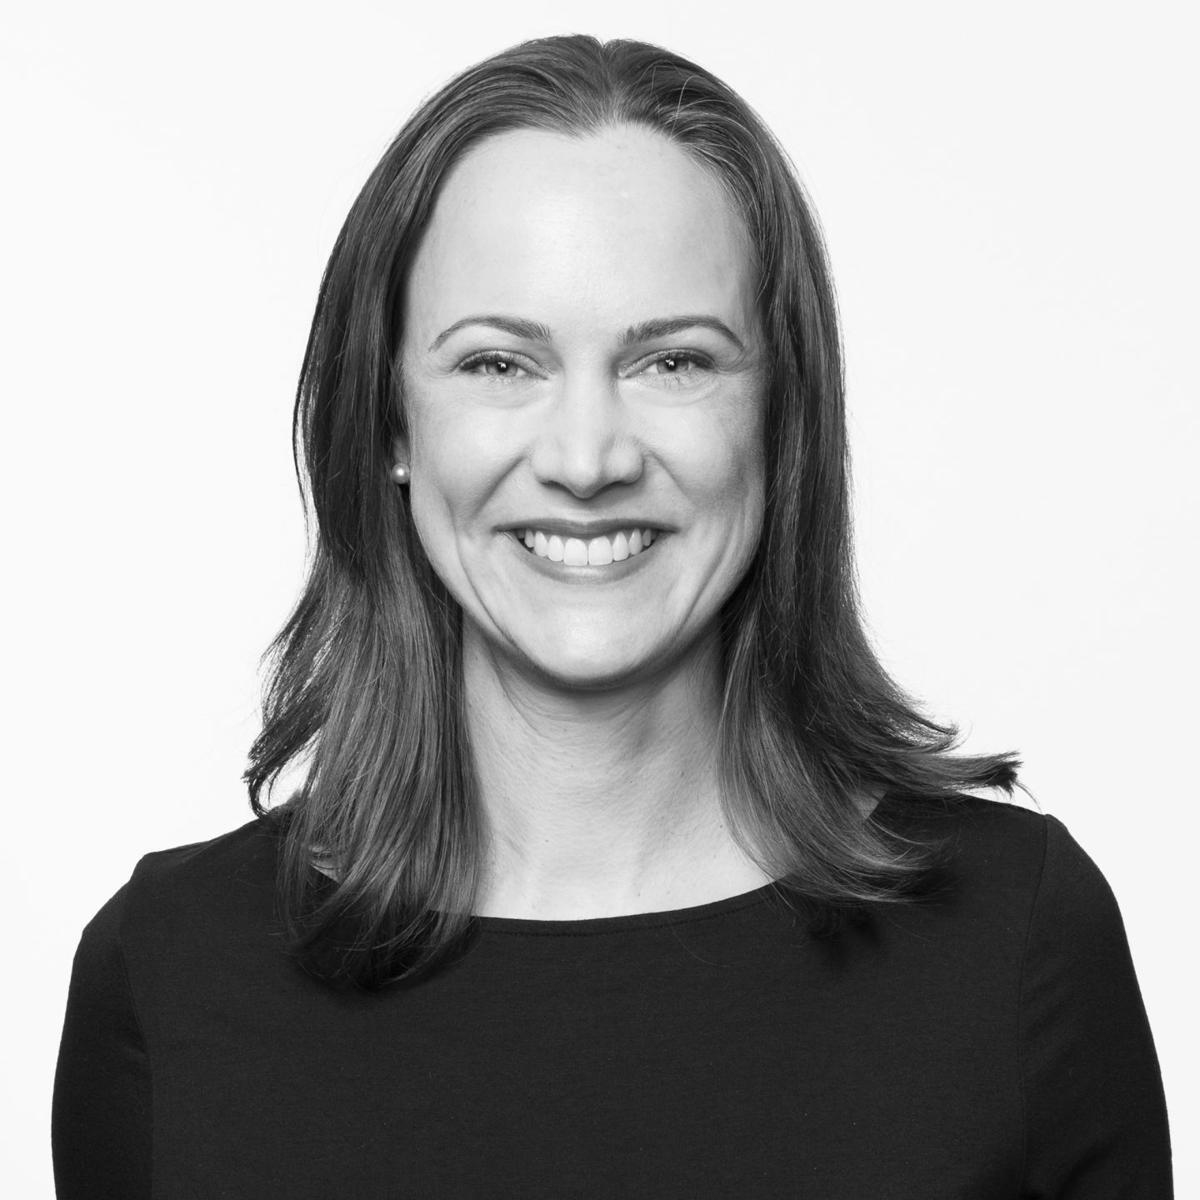 Alison Chase of NRDC